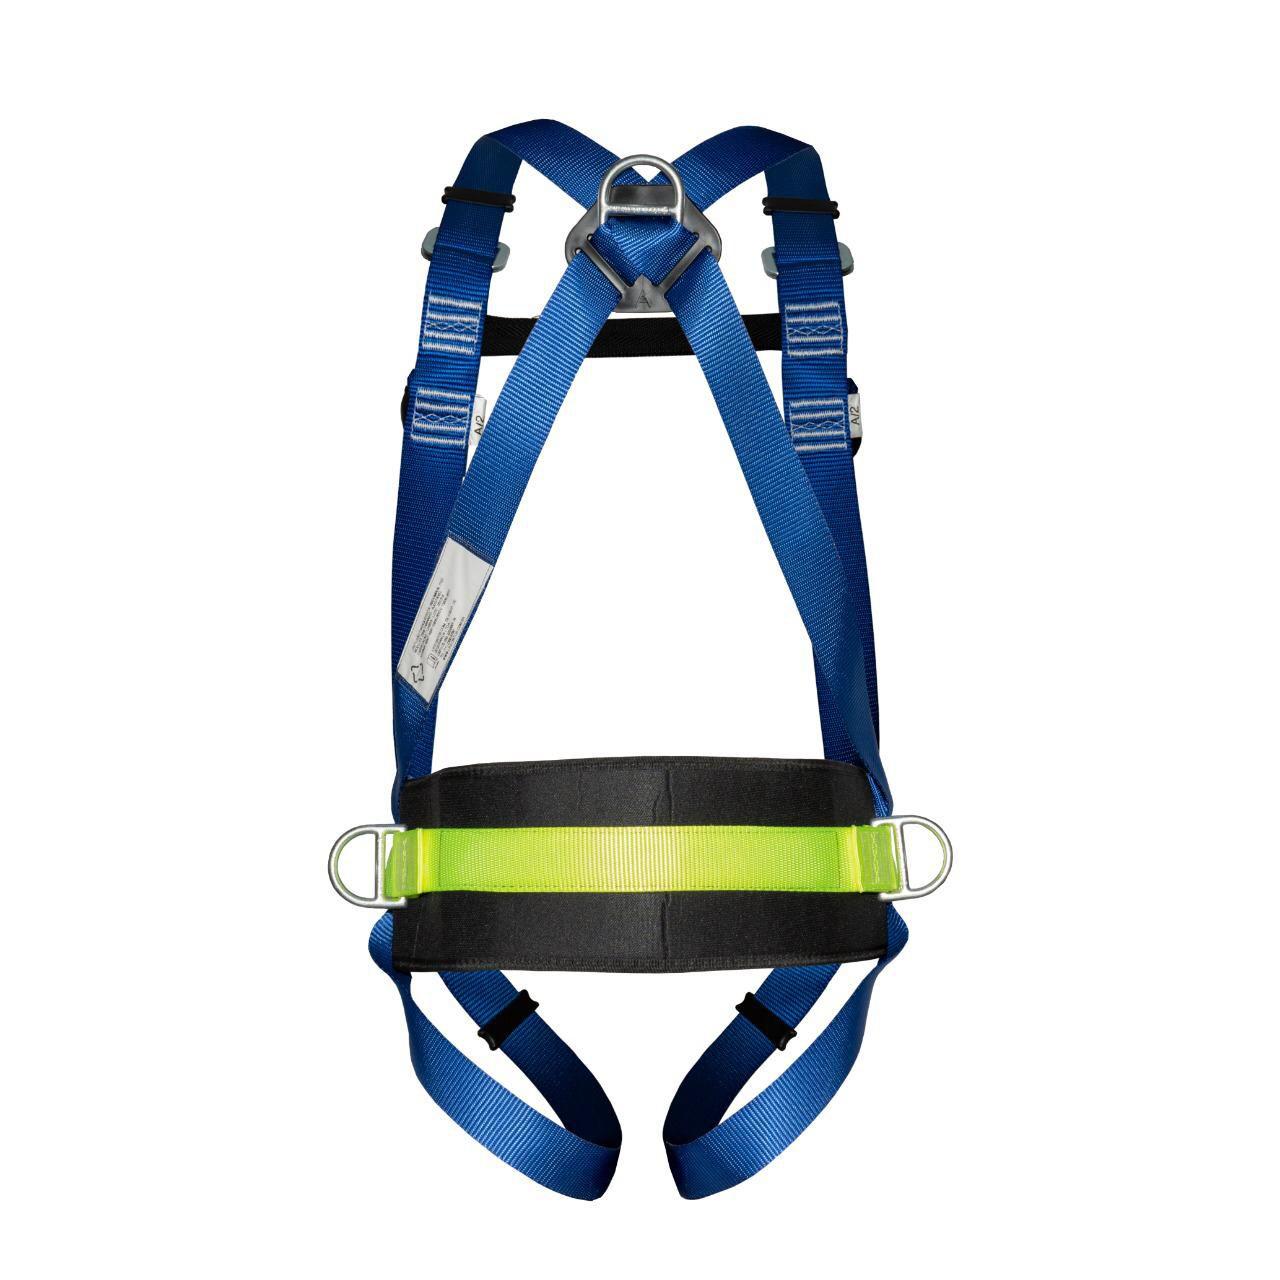 Cinturão Paraquedista 4 Ponto de Ancoragem Com Talabarte Y 55 Elastizado ABS